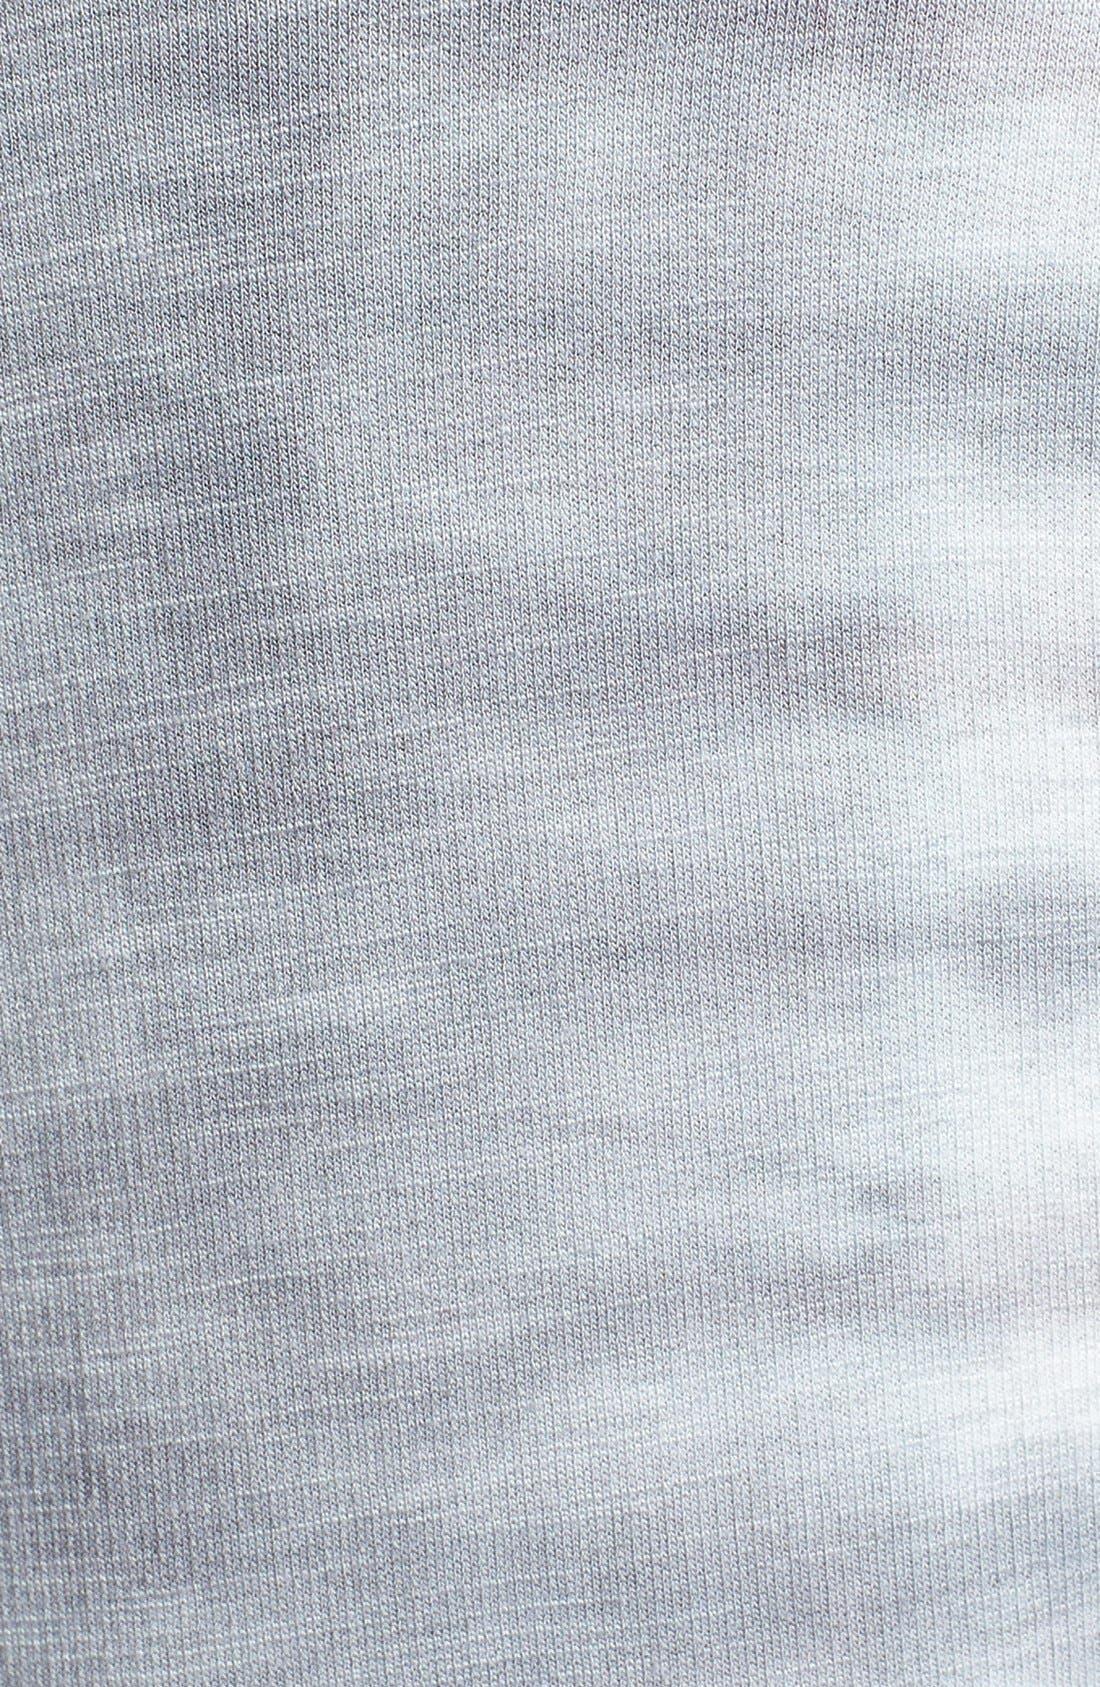 Alternate Image 3  - Monrow 'Fish Bone' Crewneck Sweatshirt